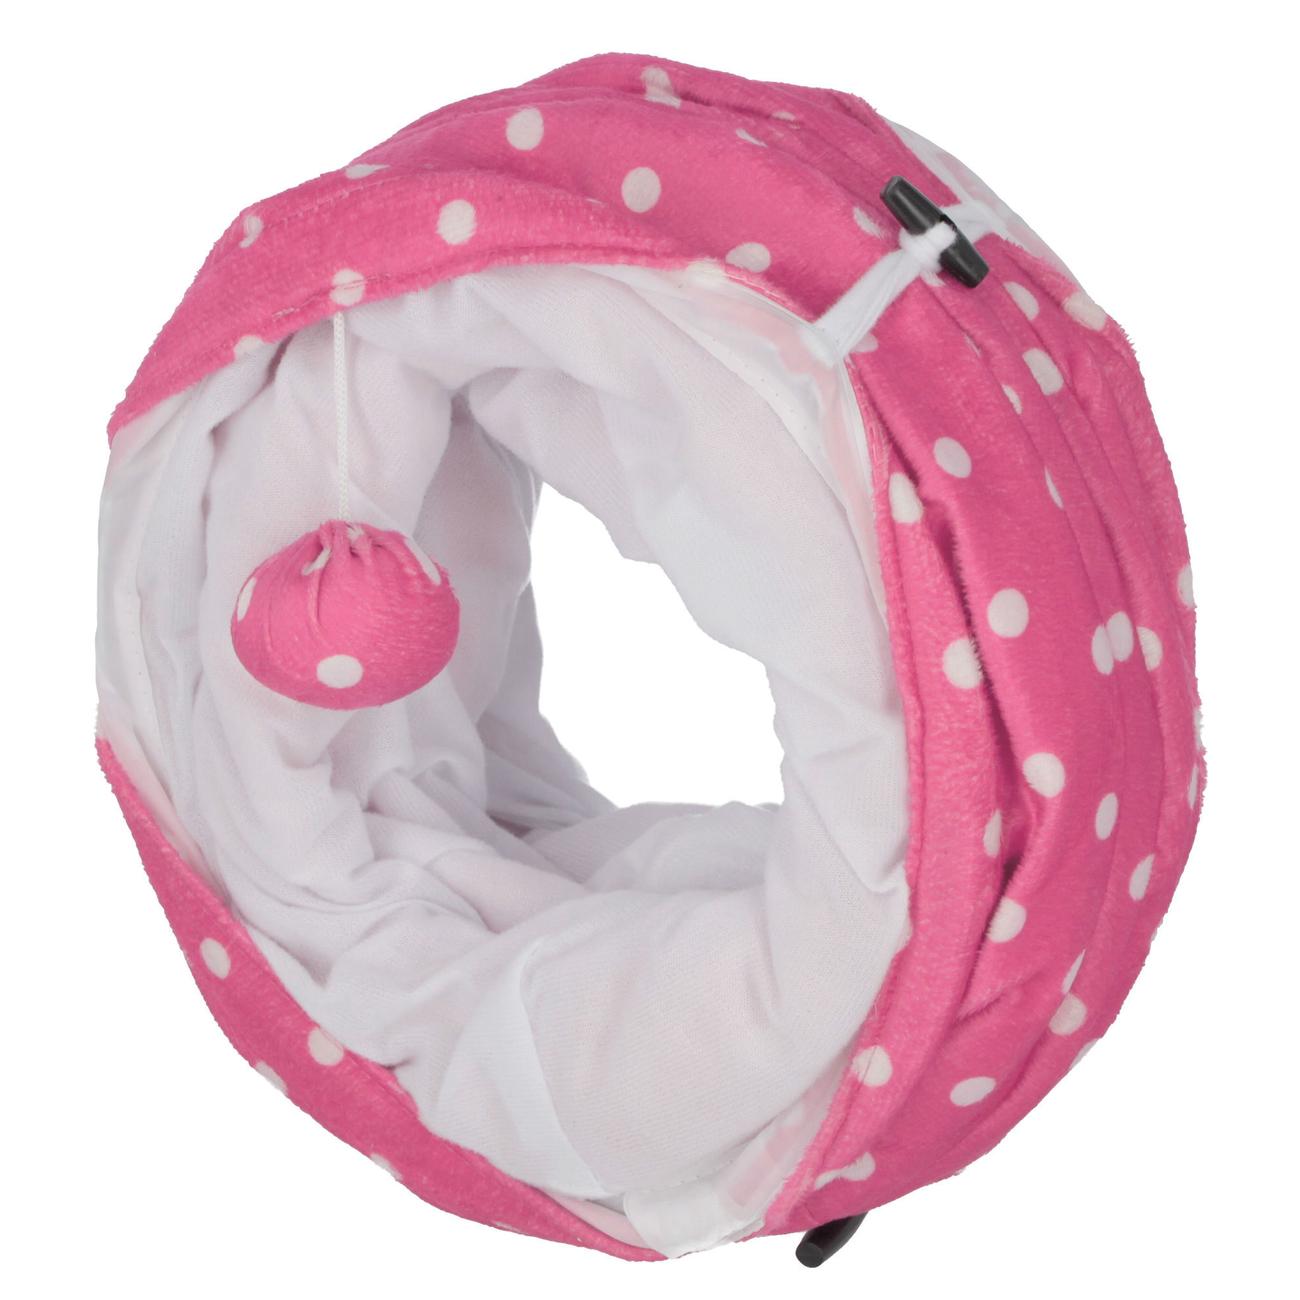 Kerbl Katzentunnel Puntino pink, Bild 4